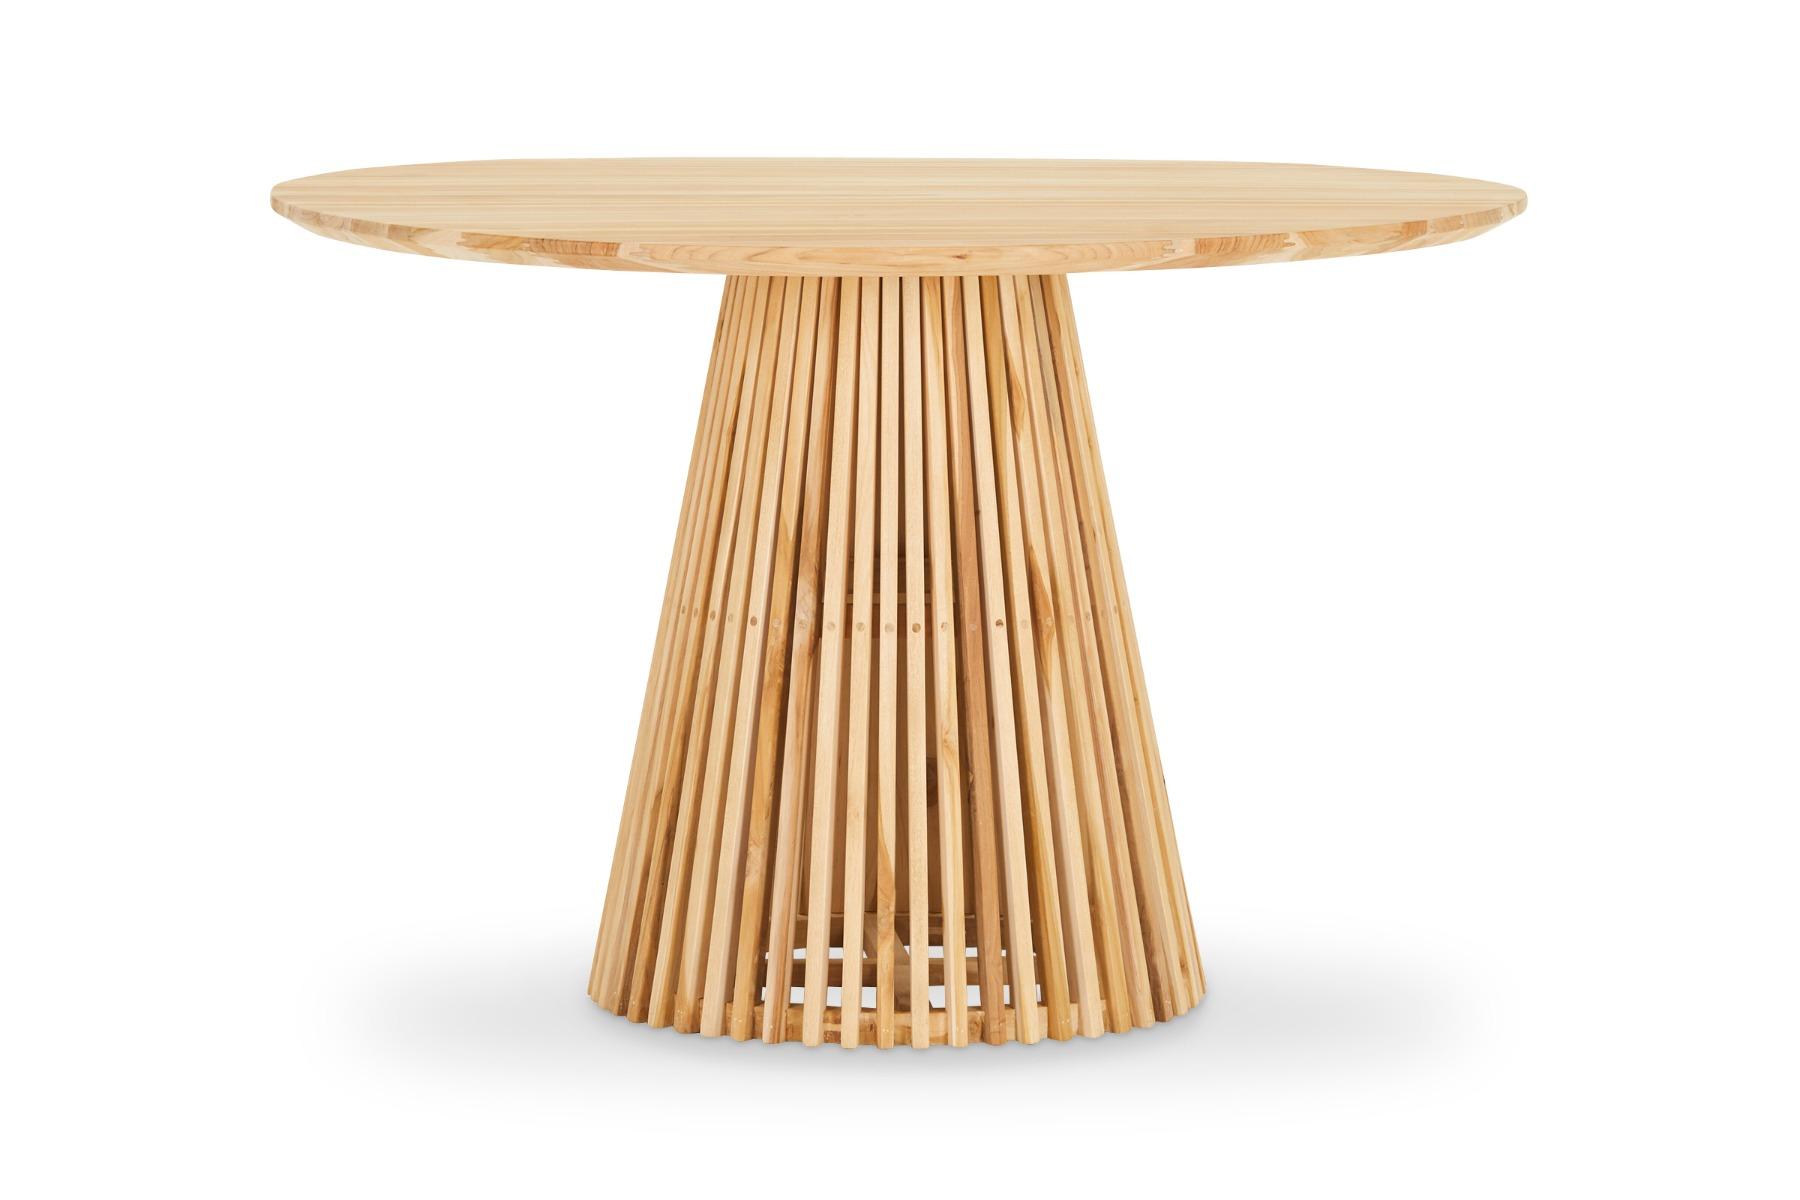 Luna Modern Dining Table Oak by Lounge Lovers by Lounge Lovers, a Dining Tables for sale on Style Sourcebook